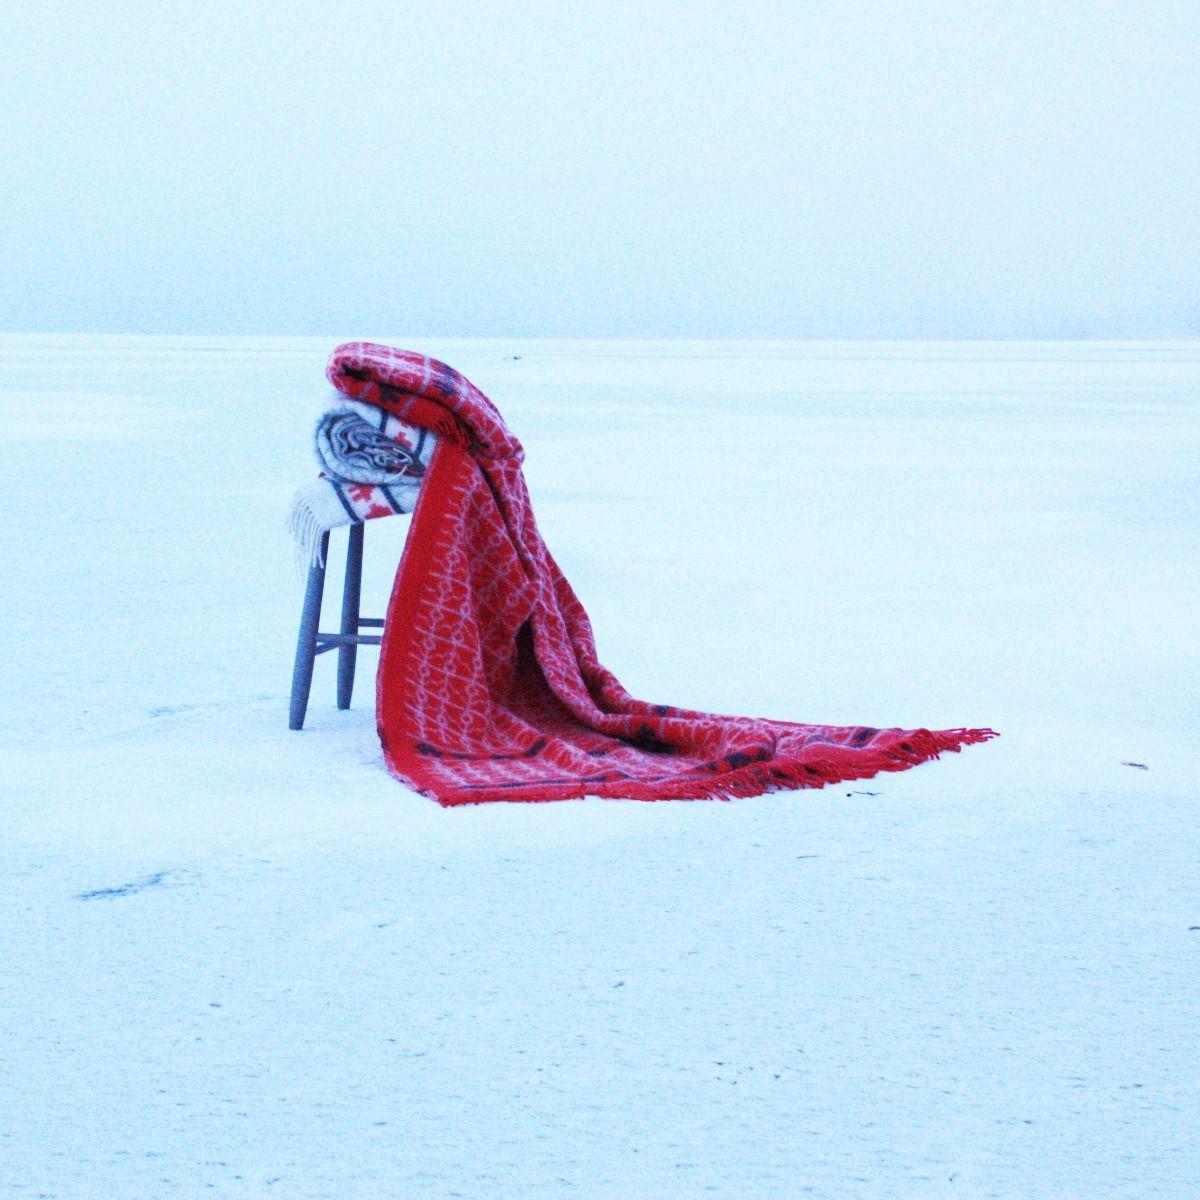 Öjbro Ekshärad Röd 100% Merino Wool Blanket 130x220cm